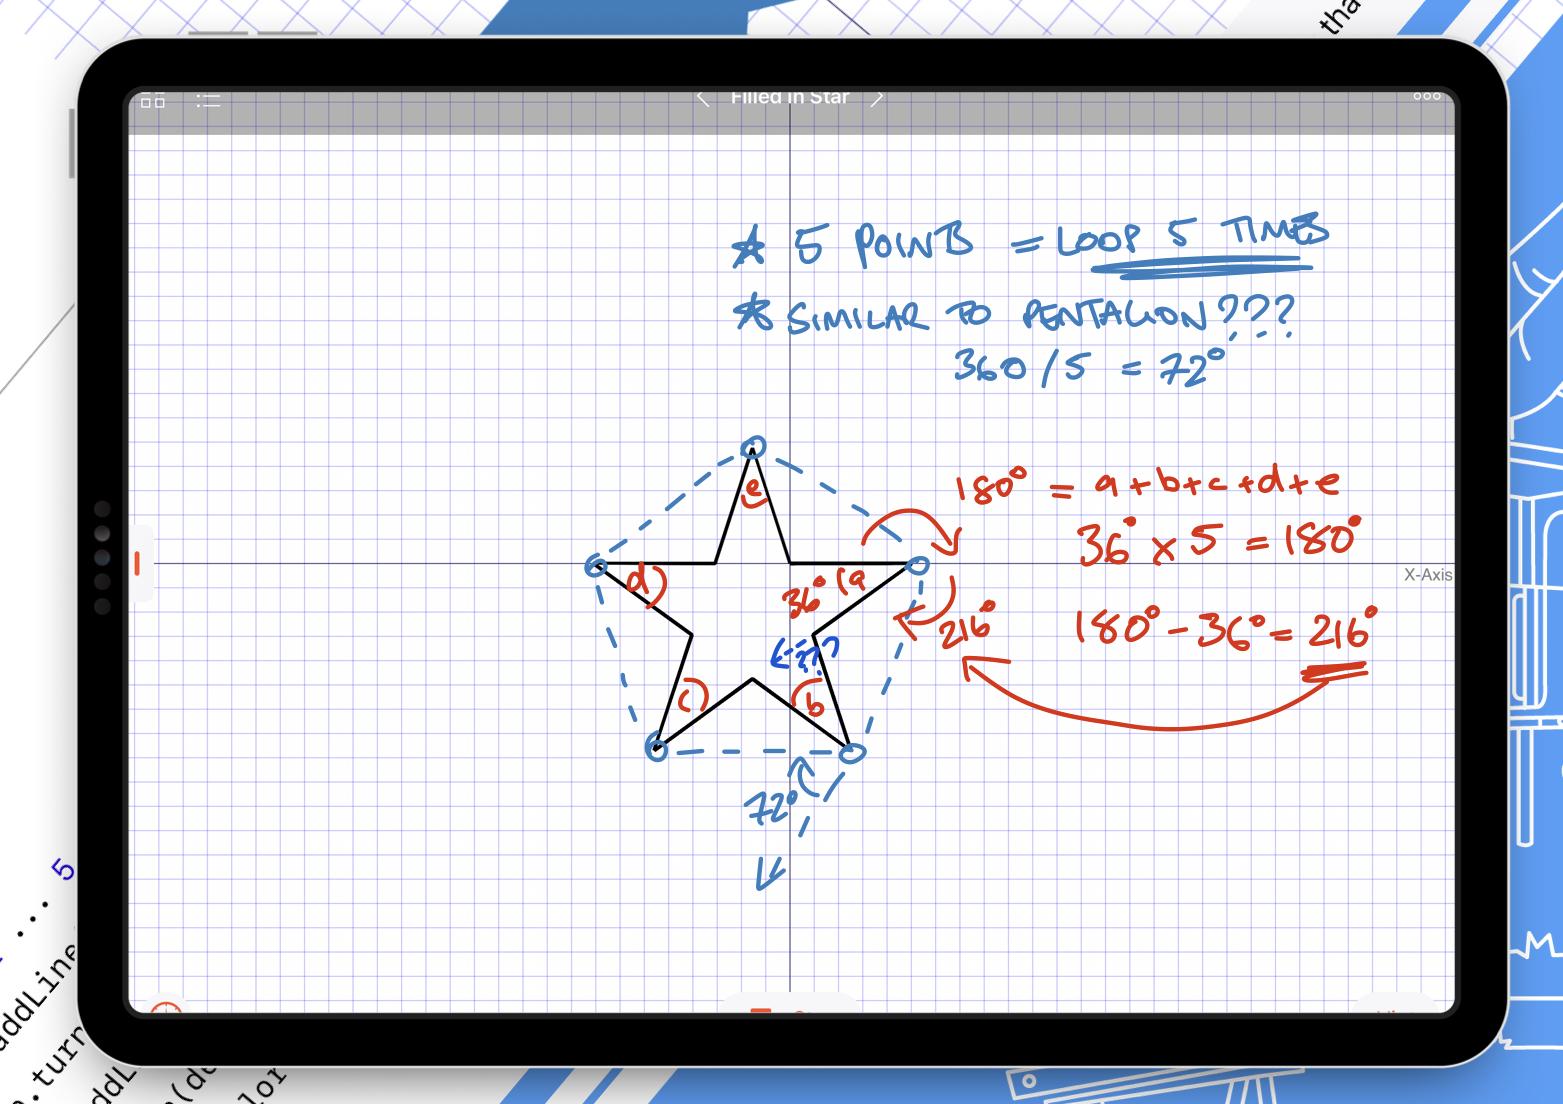 Daniel_Budd_Coding_Mathematics.jpg